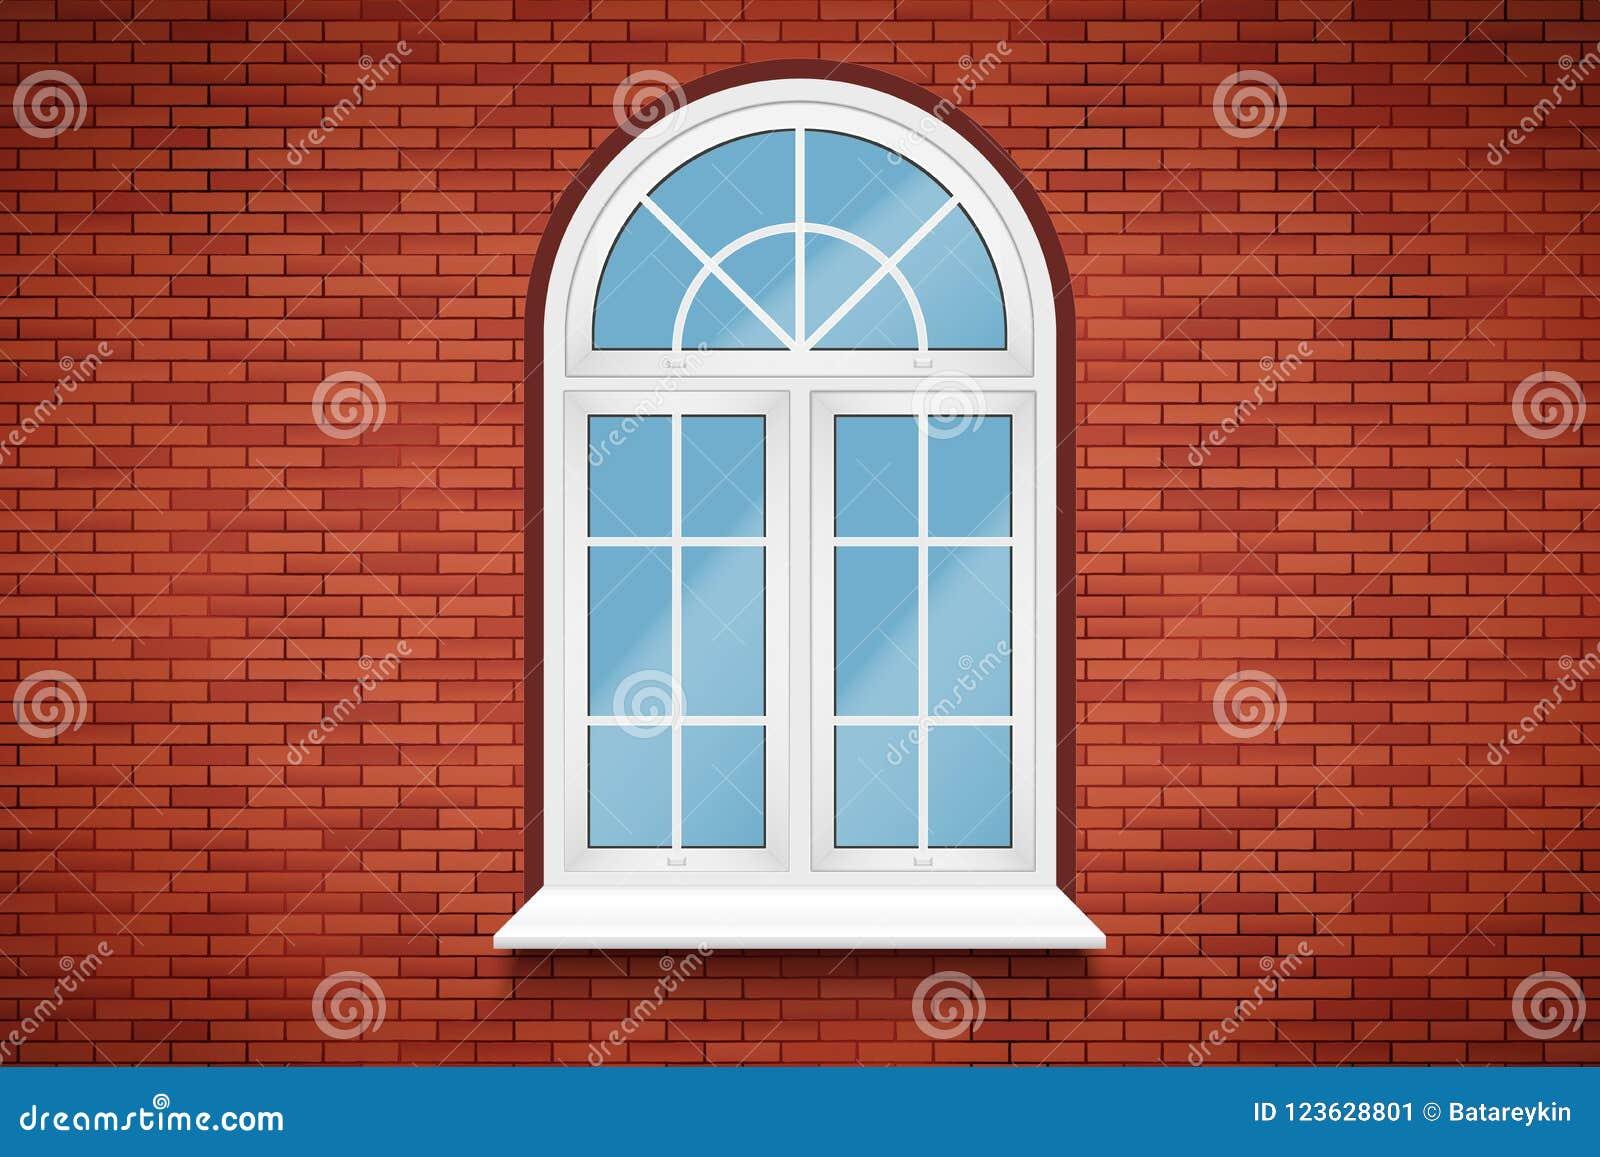 Ventanas Pvc Stock.Pvc Arch Window Stock Vector Illustration Of Double 123628801